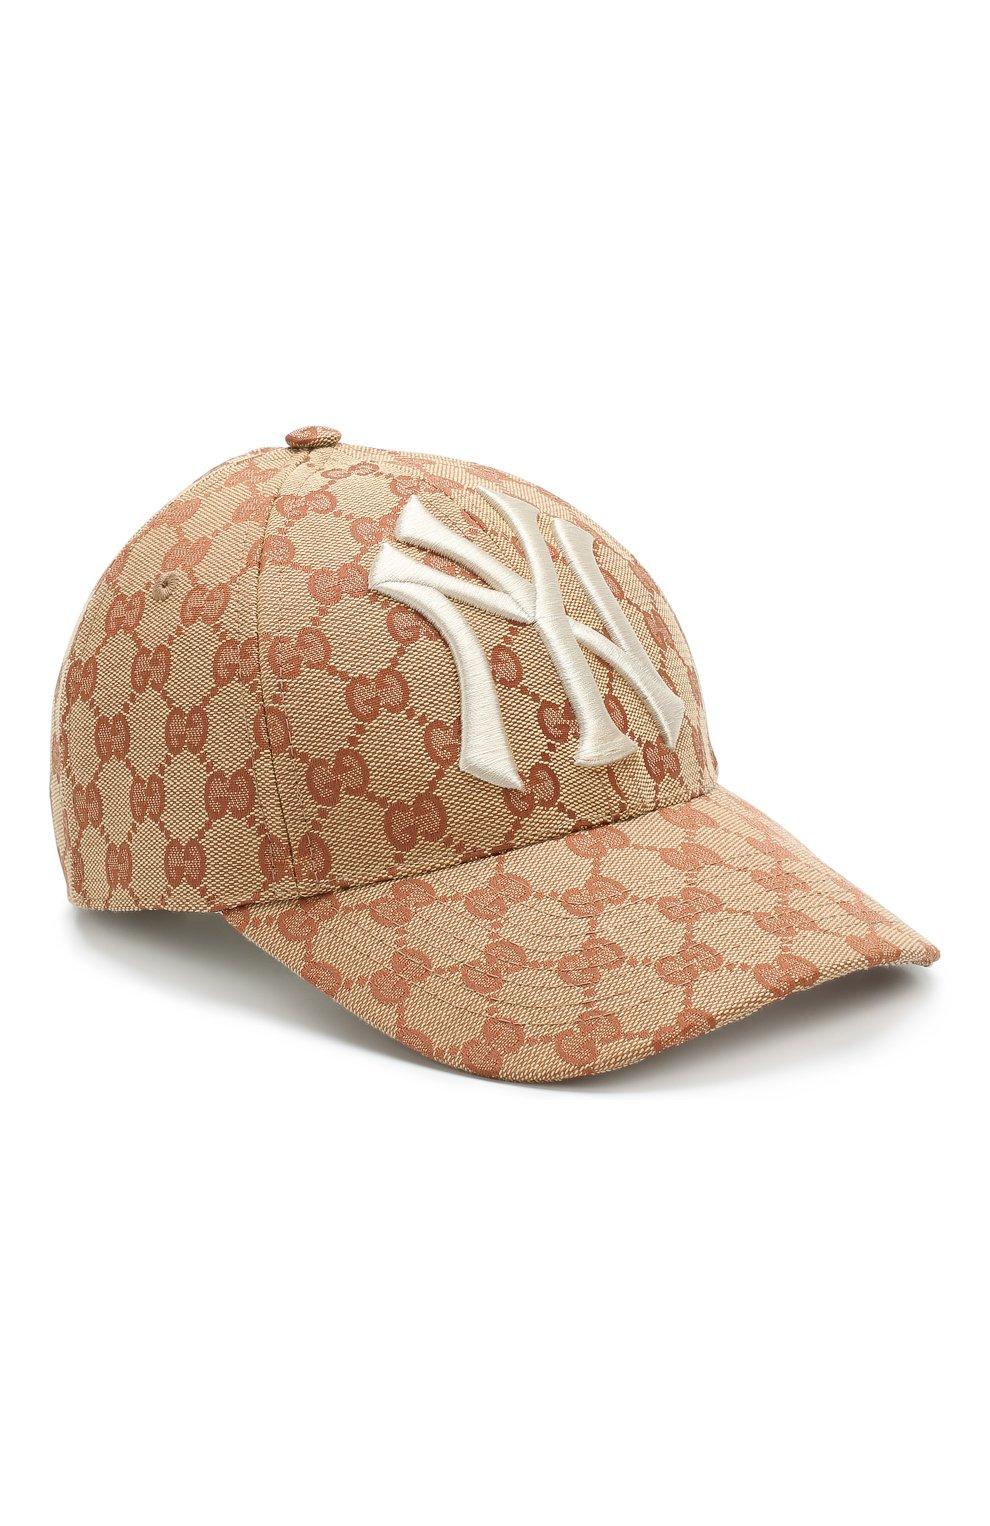 Текстильная кепка GG Supreme | Фото №1